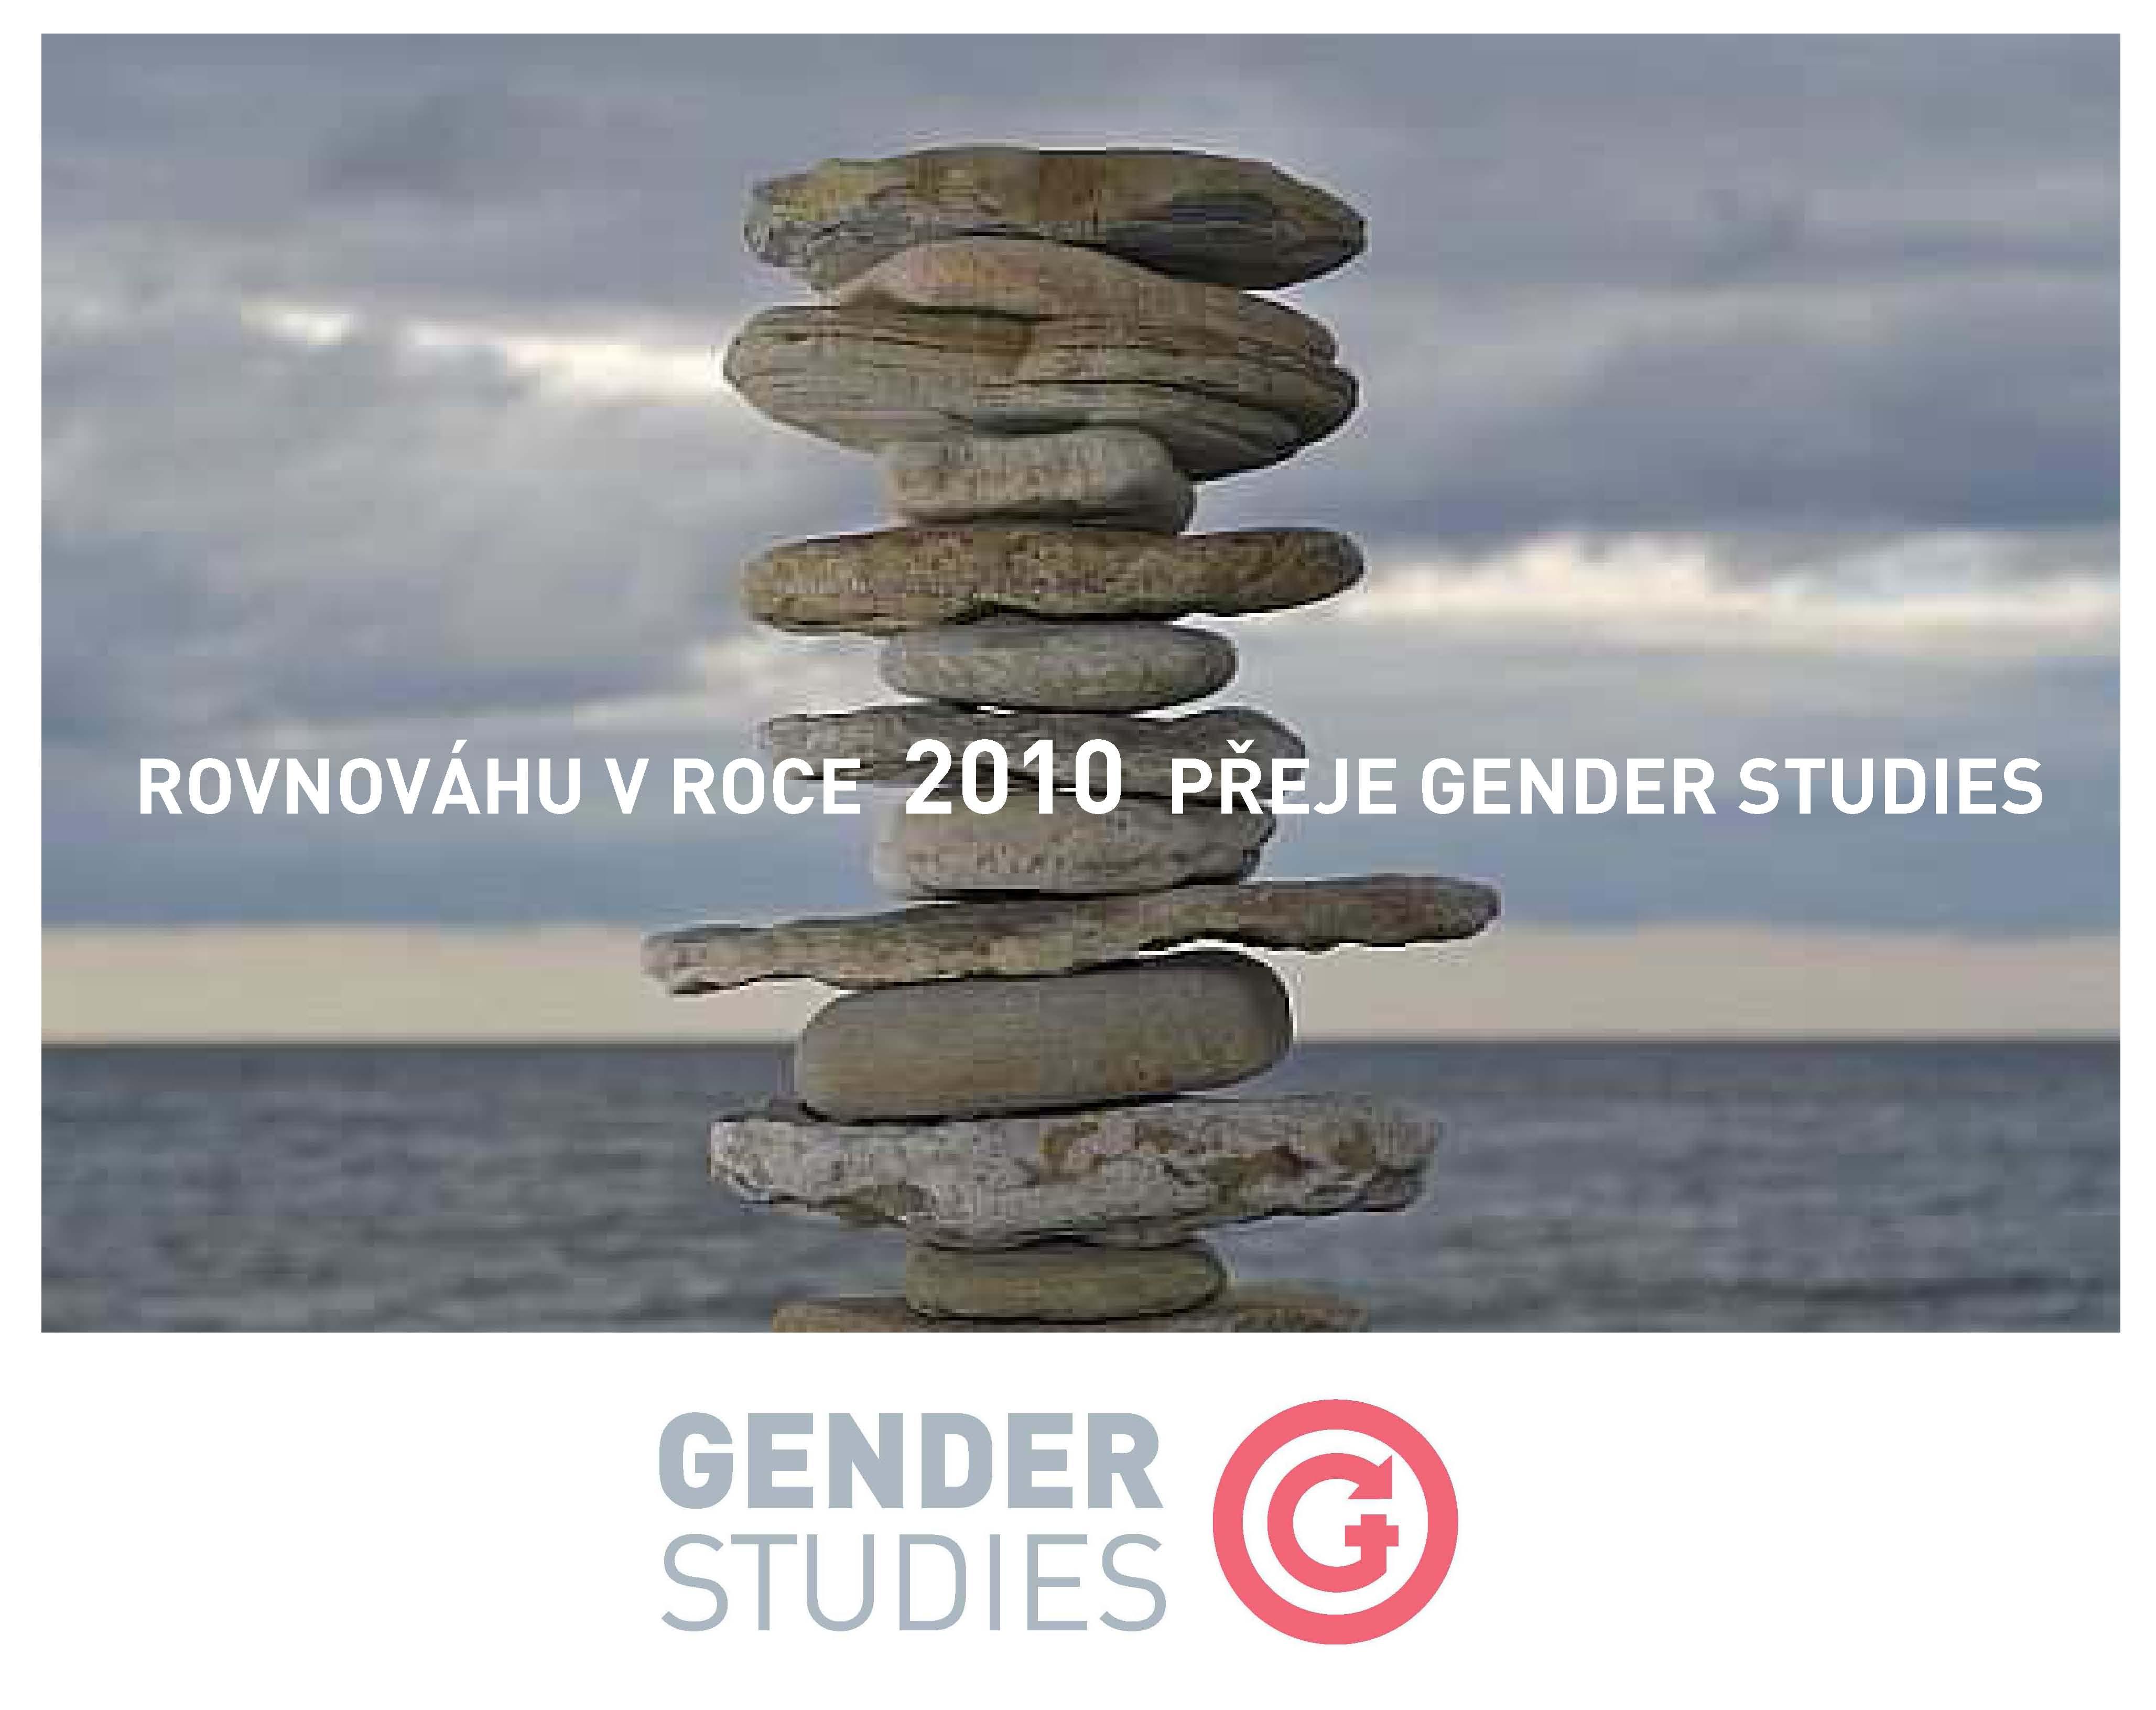 Gender Studies přeje šťastný a klidný rok 2010!